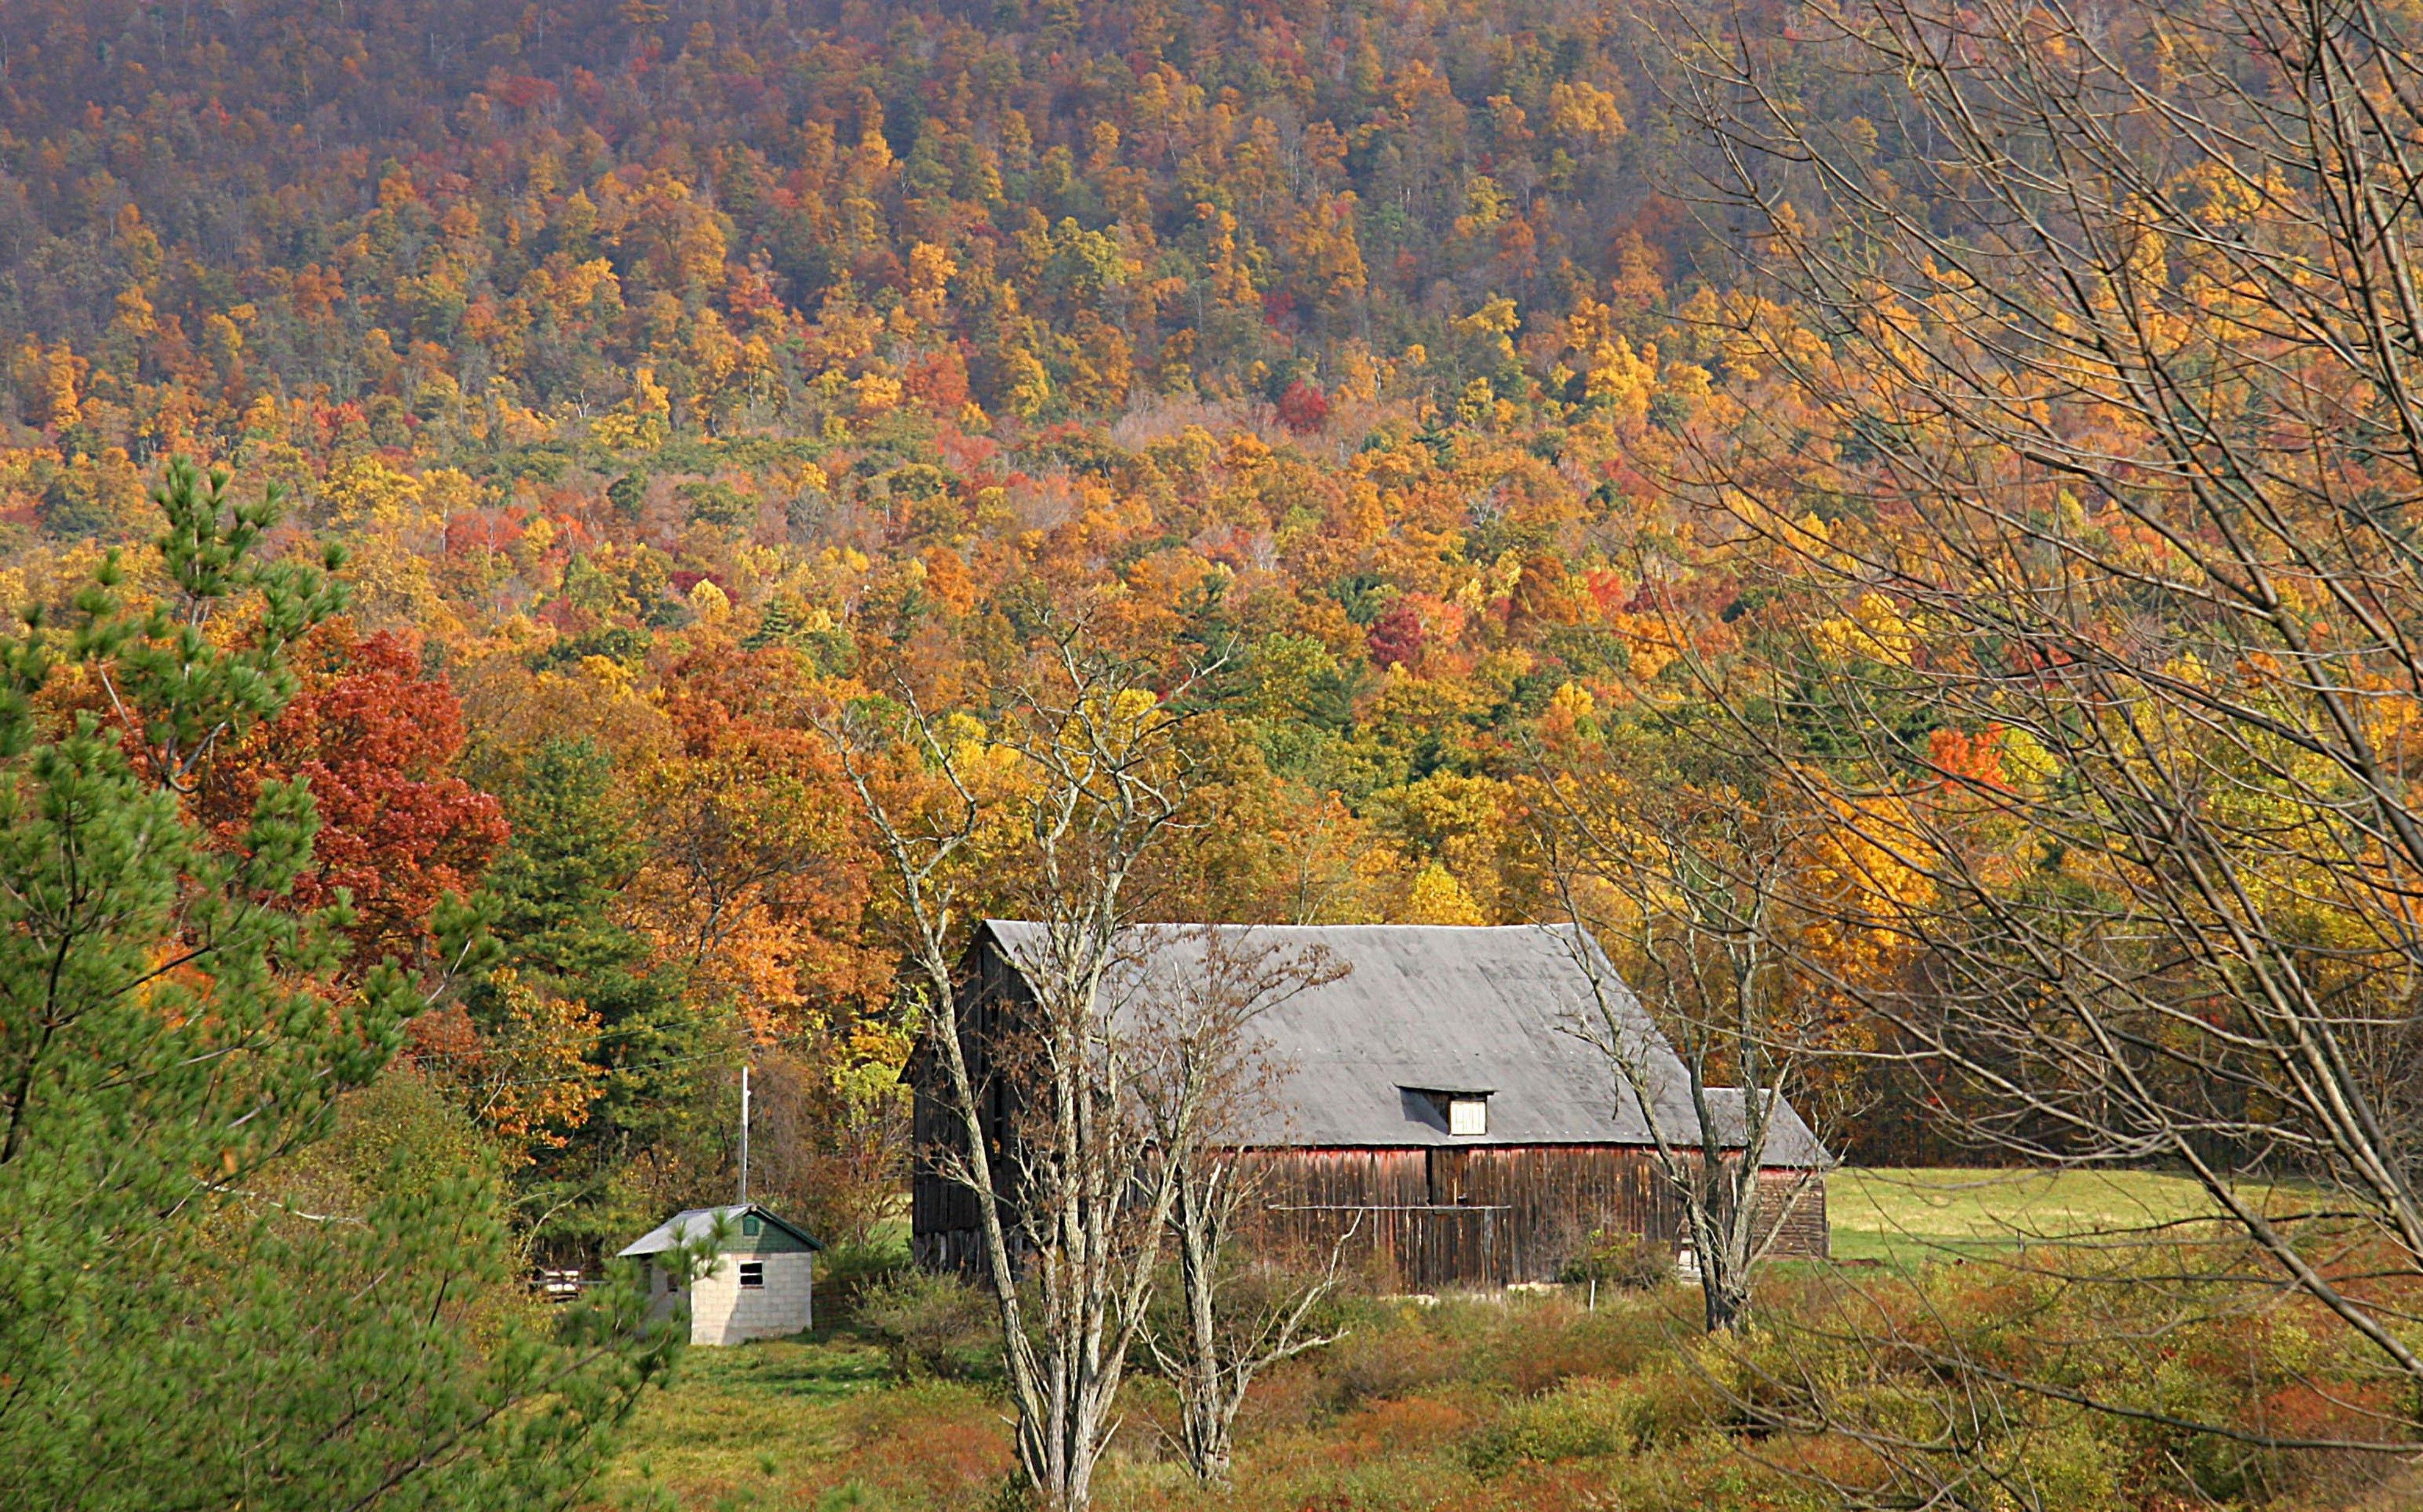 US, Pennsylvania, Bedford County, fall foliage